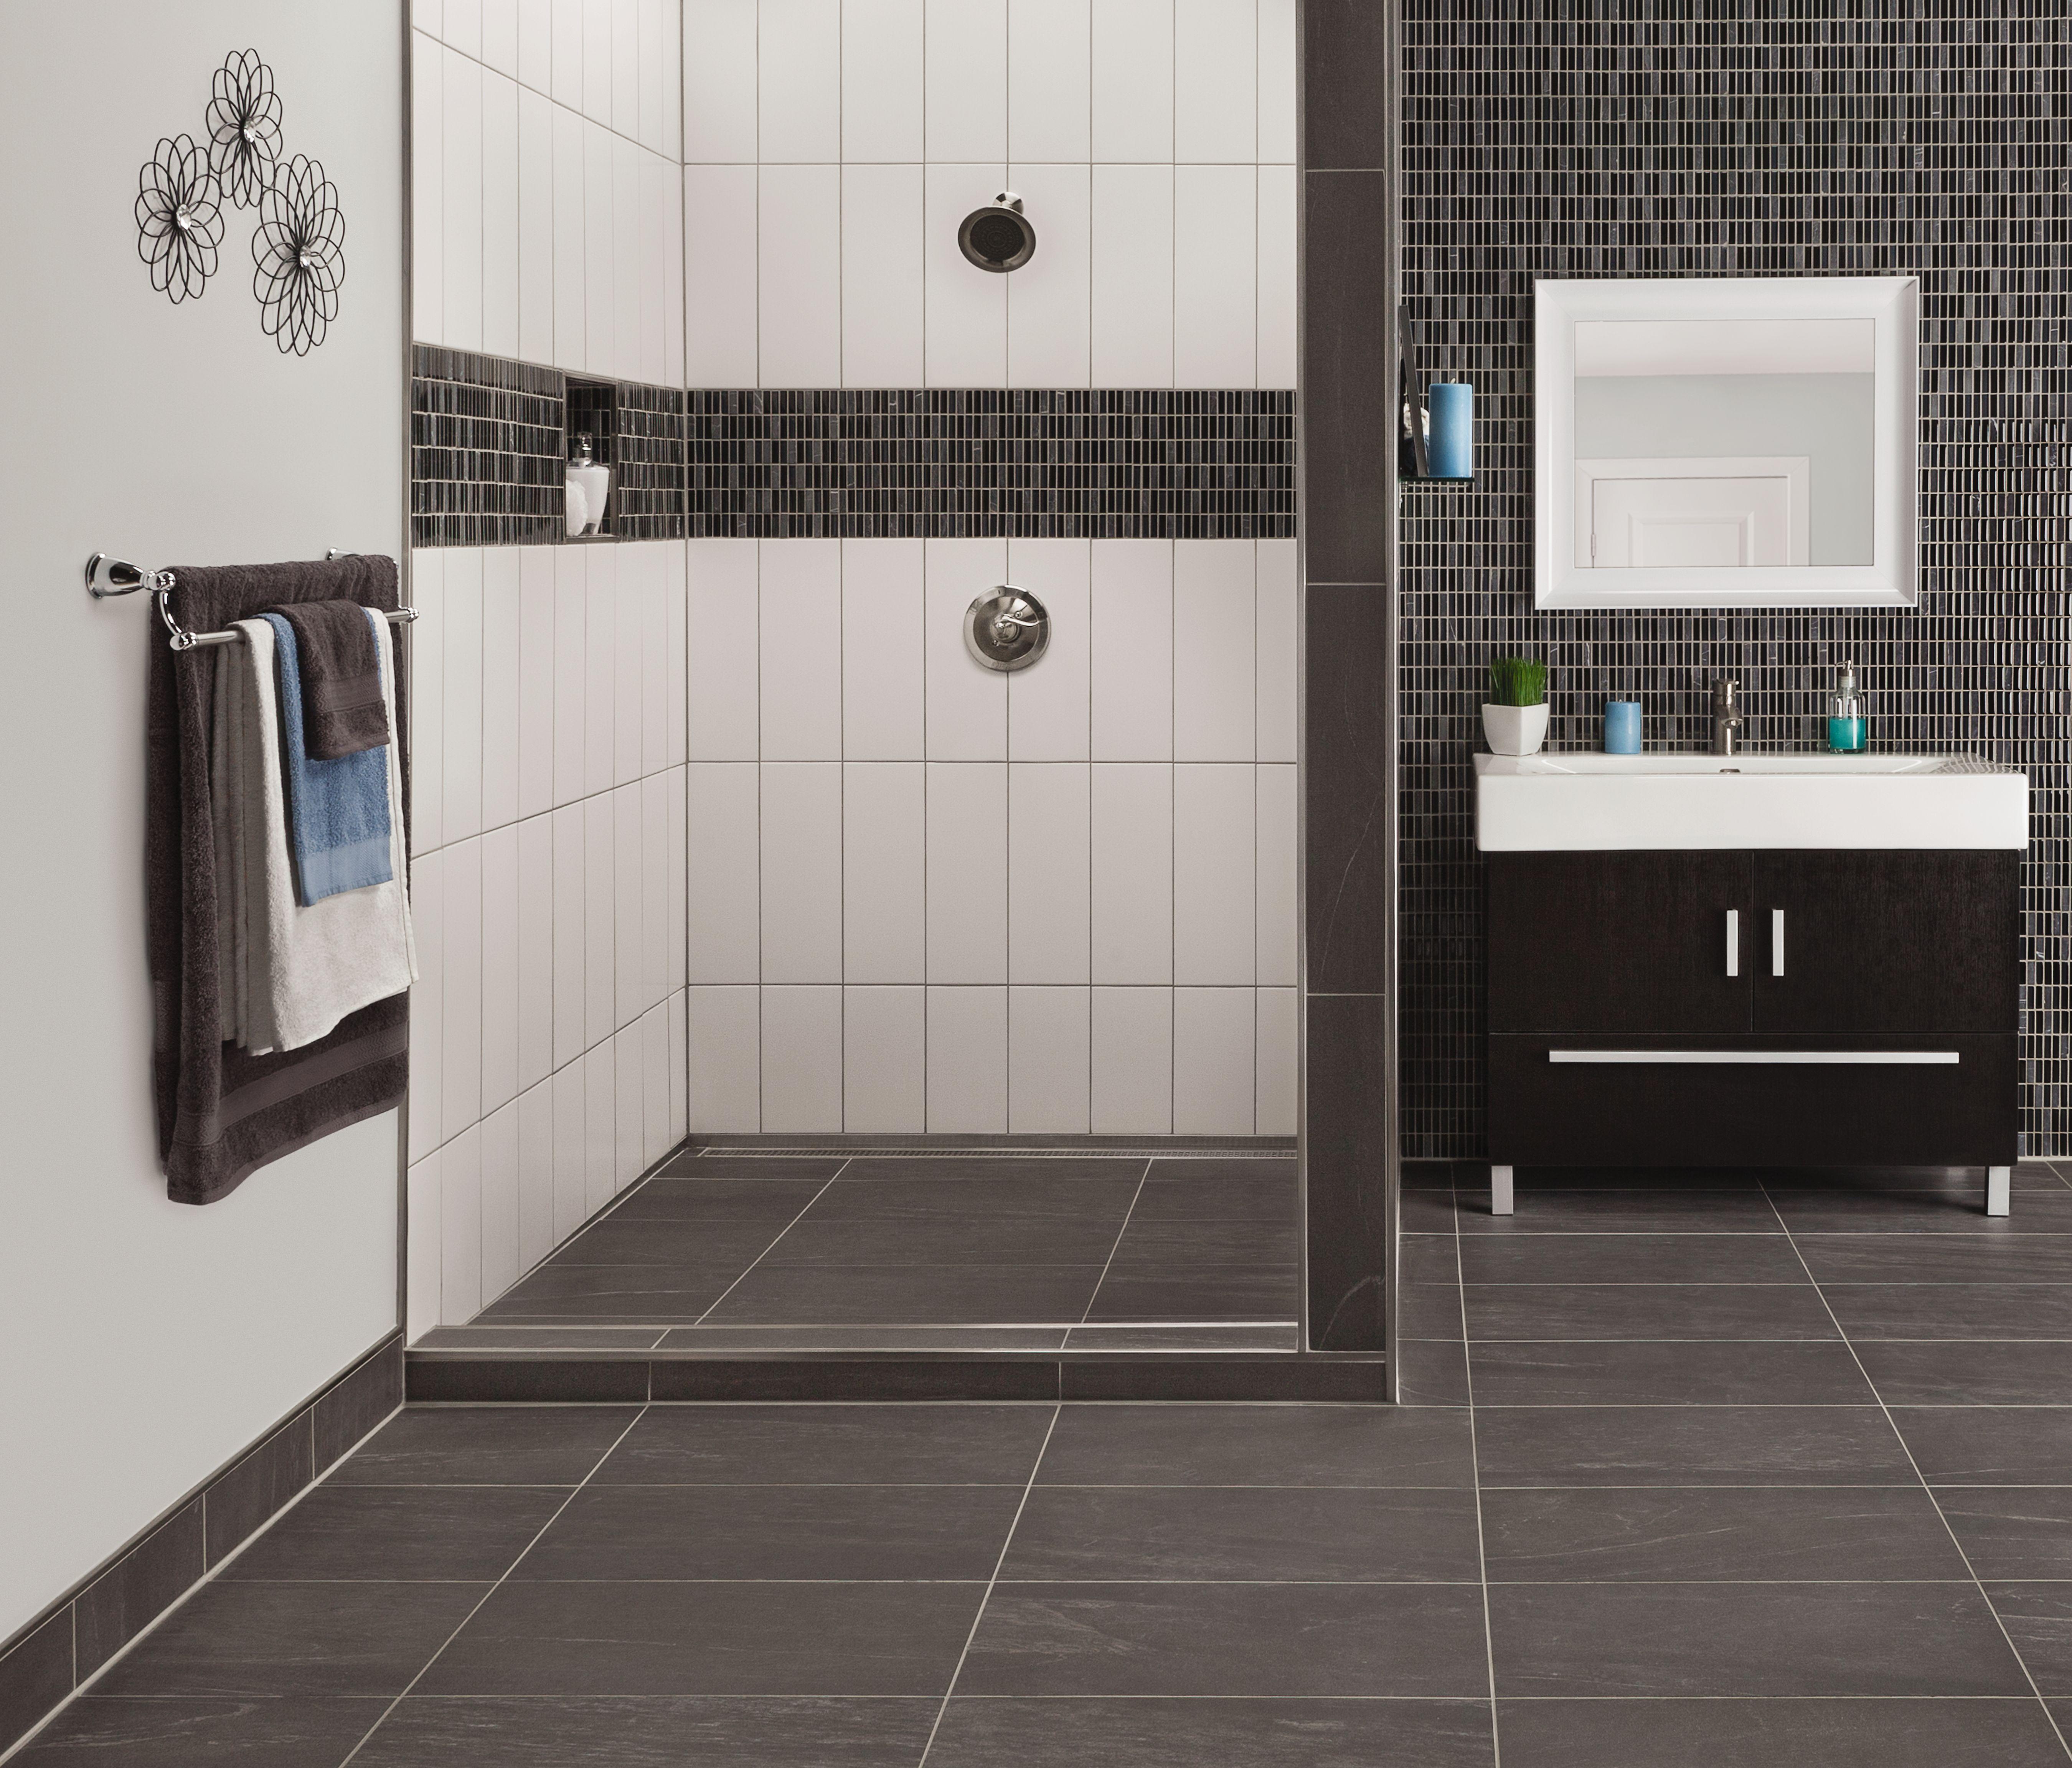 Bathroom tile floor installation